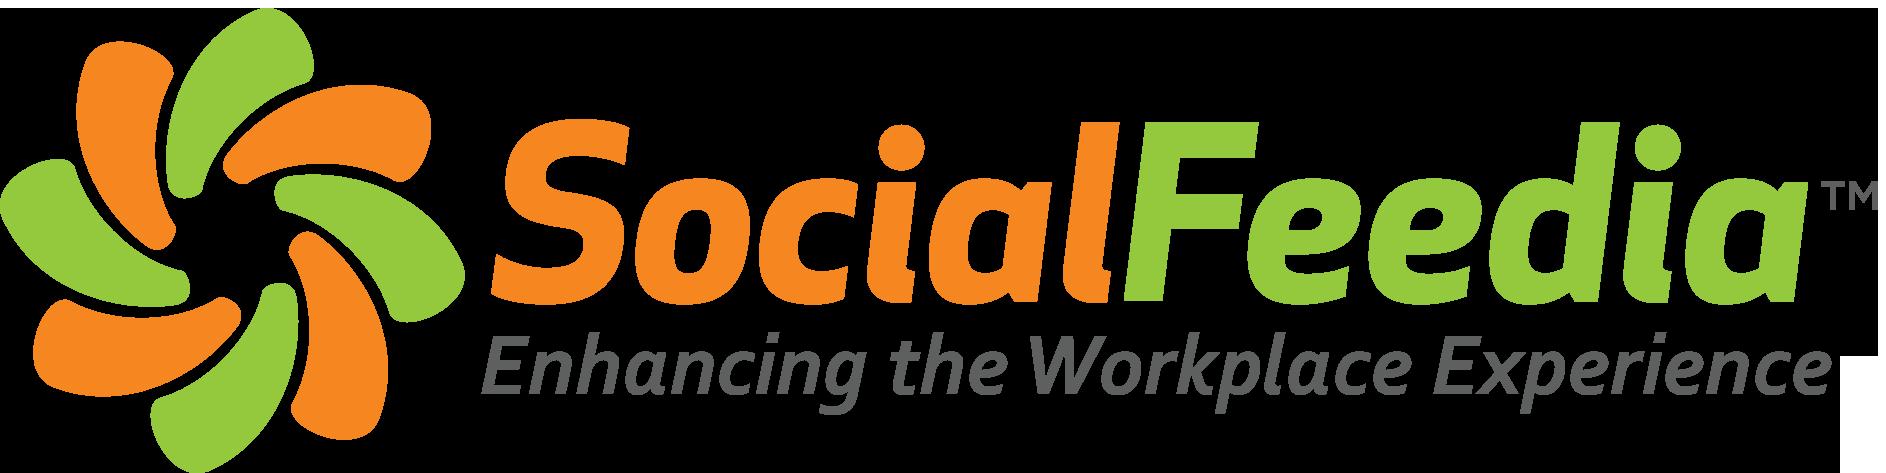 Social Feedia